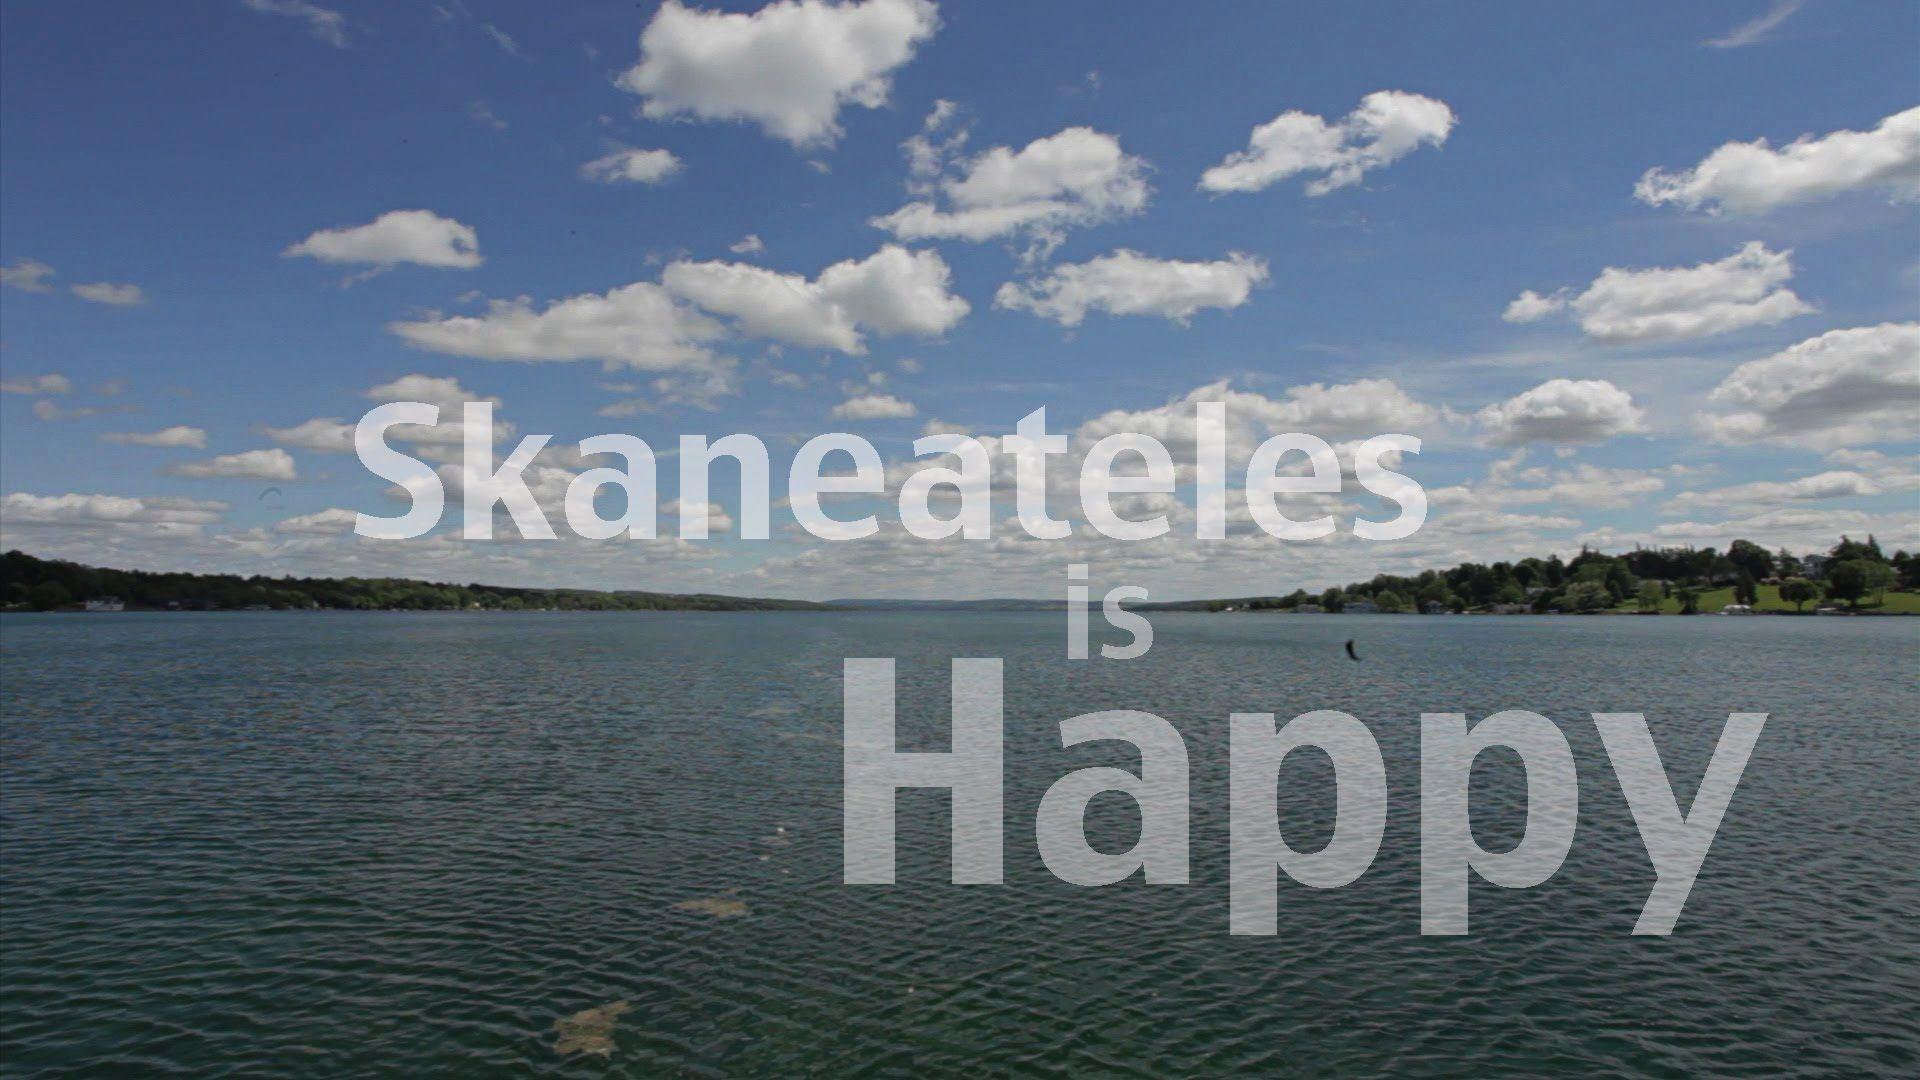 Skaneateles Happy Skaneateles, Skaneateles lake, How to